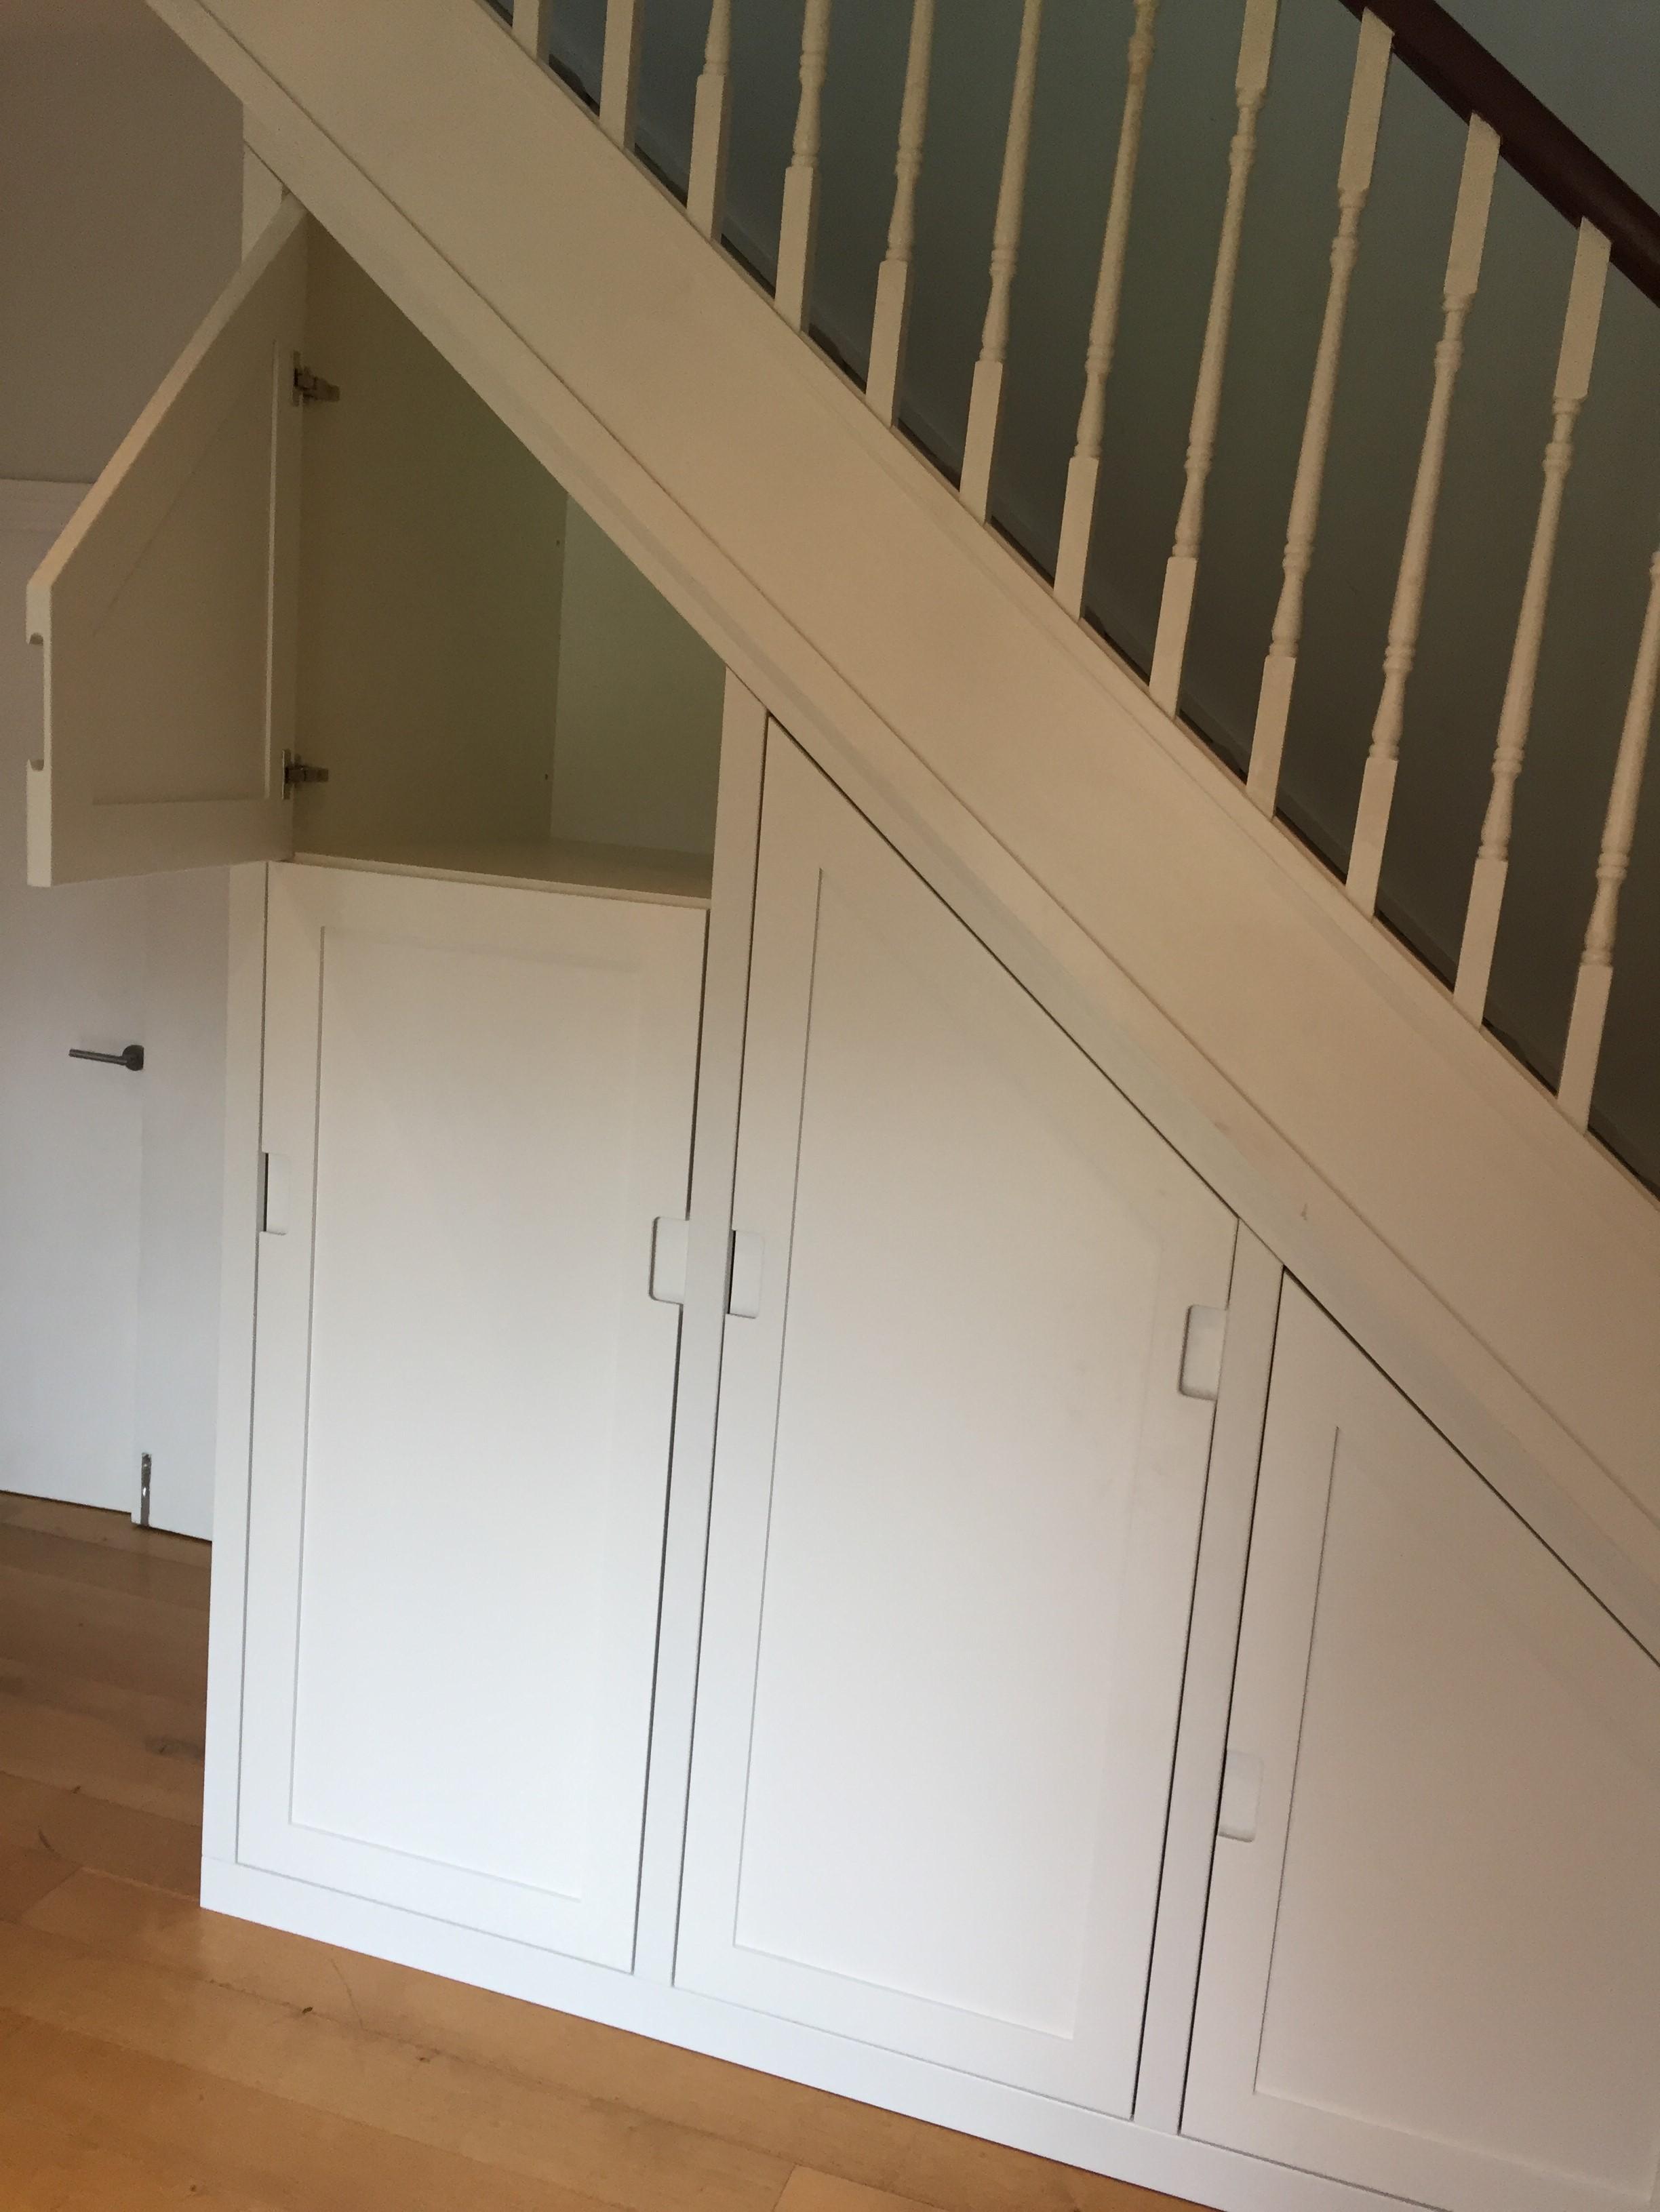 Bespoke Under stair Drawers & Bespoke Understairs Storage | Concept-Carpentry Cambridge